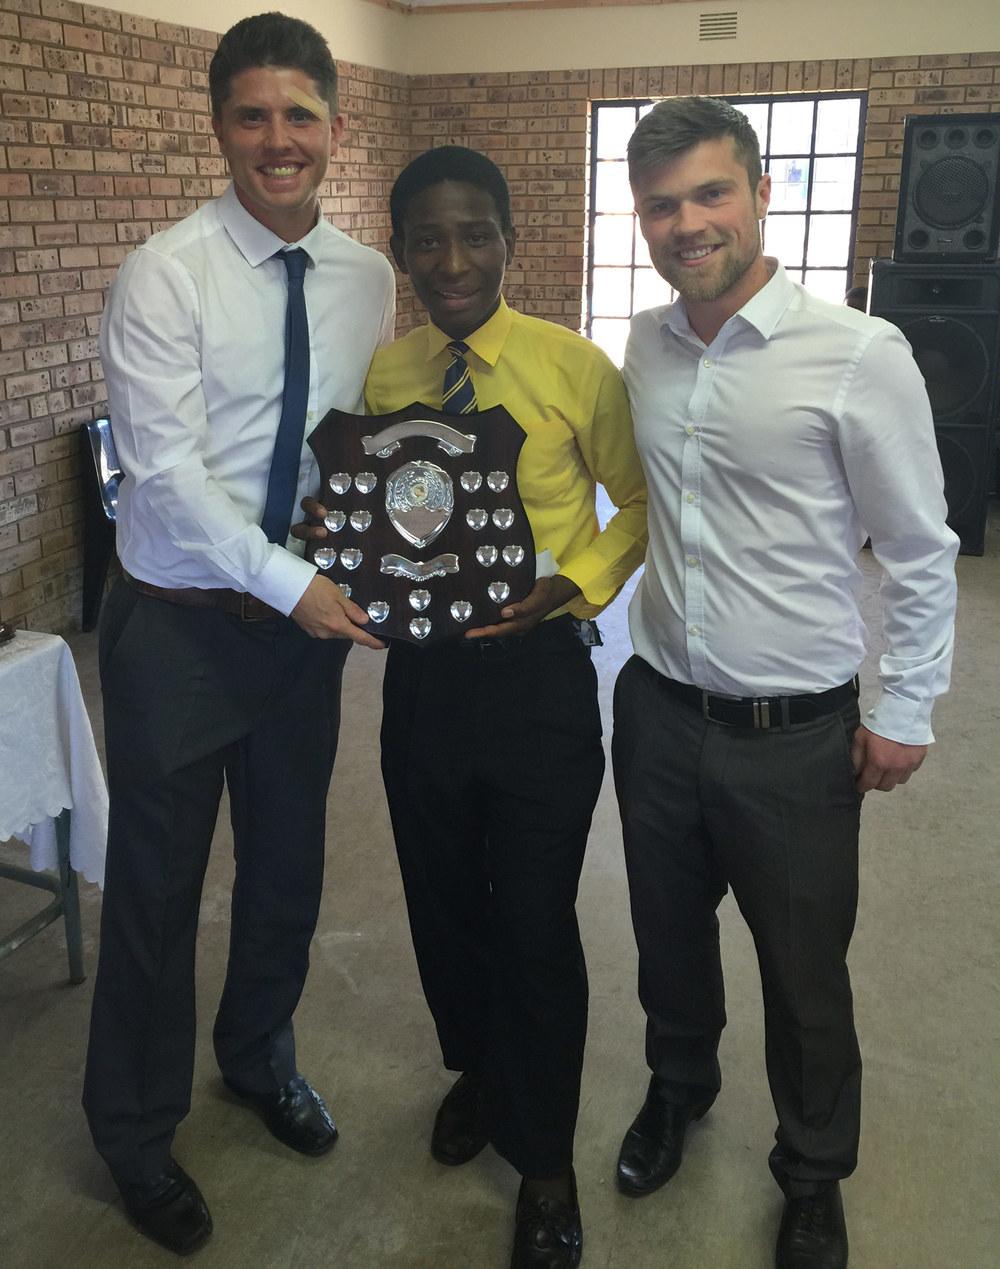 Photo: Mr T Pringle, Magwaza Standiwe, Mr G Wilkes